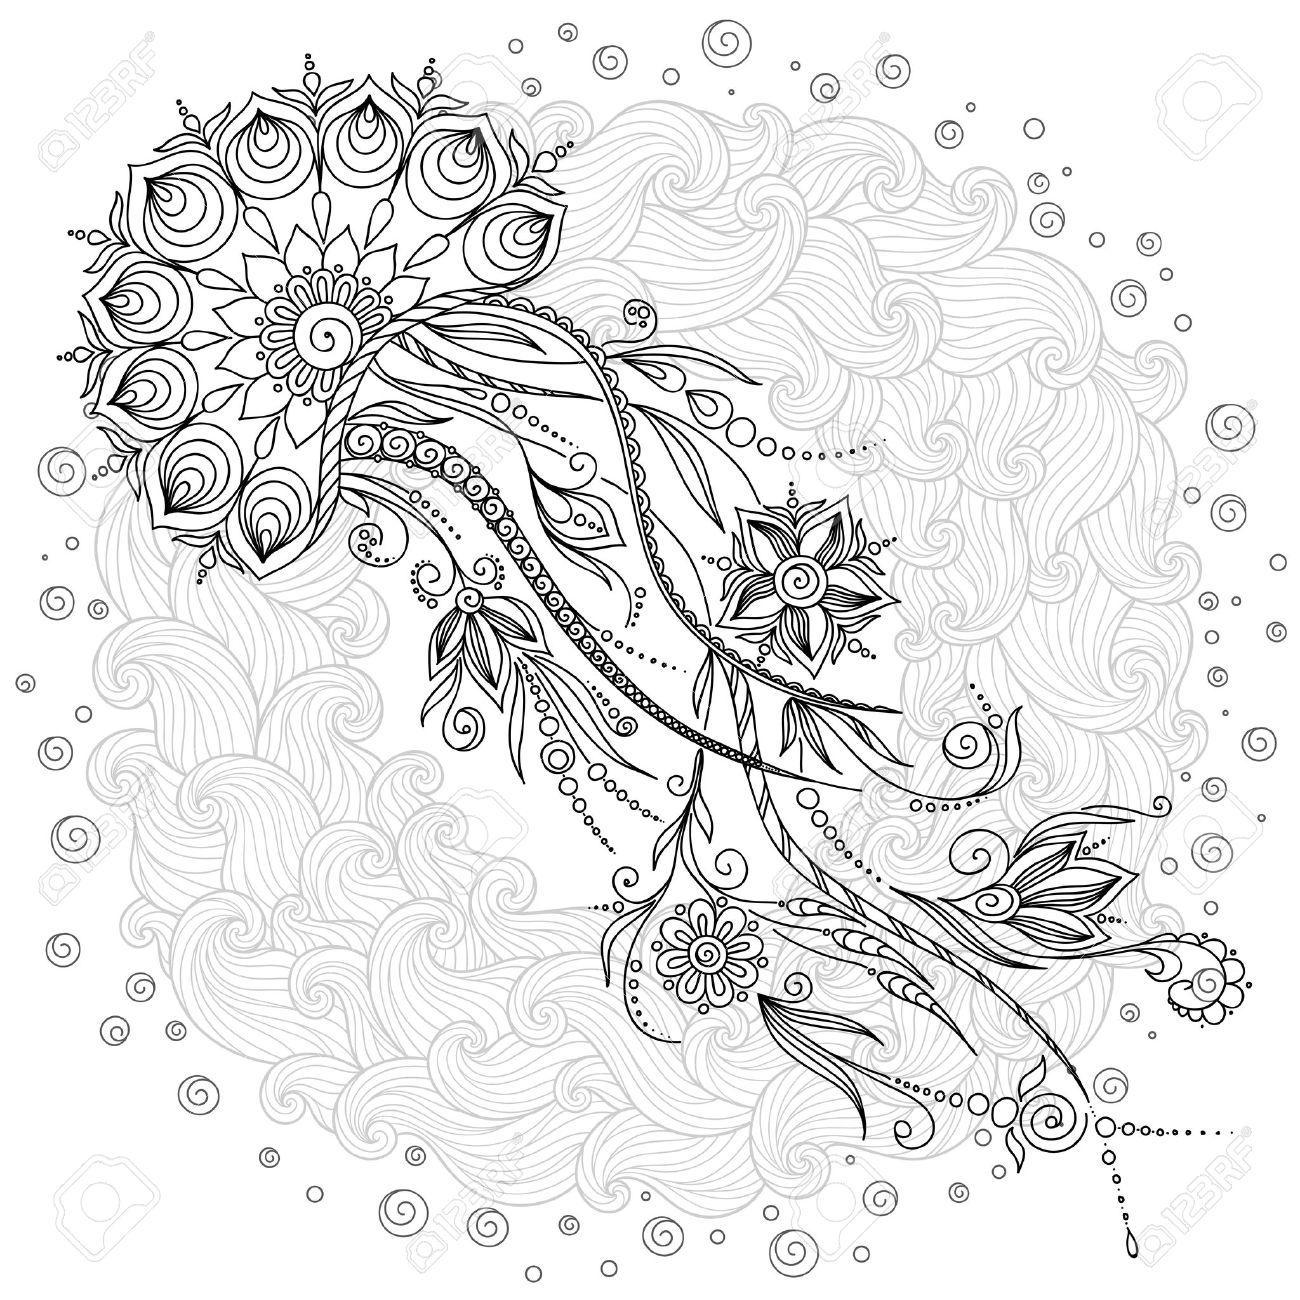 Jellies coloring #5, Download drawings